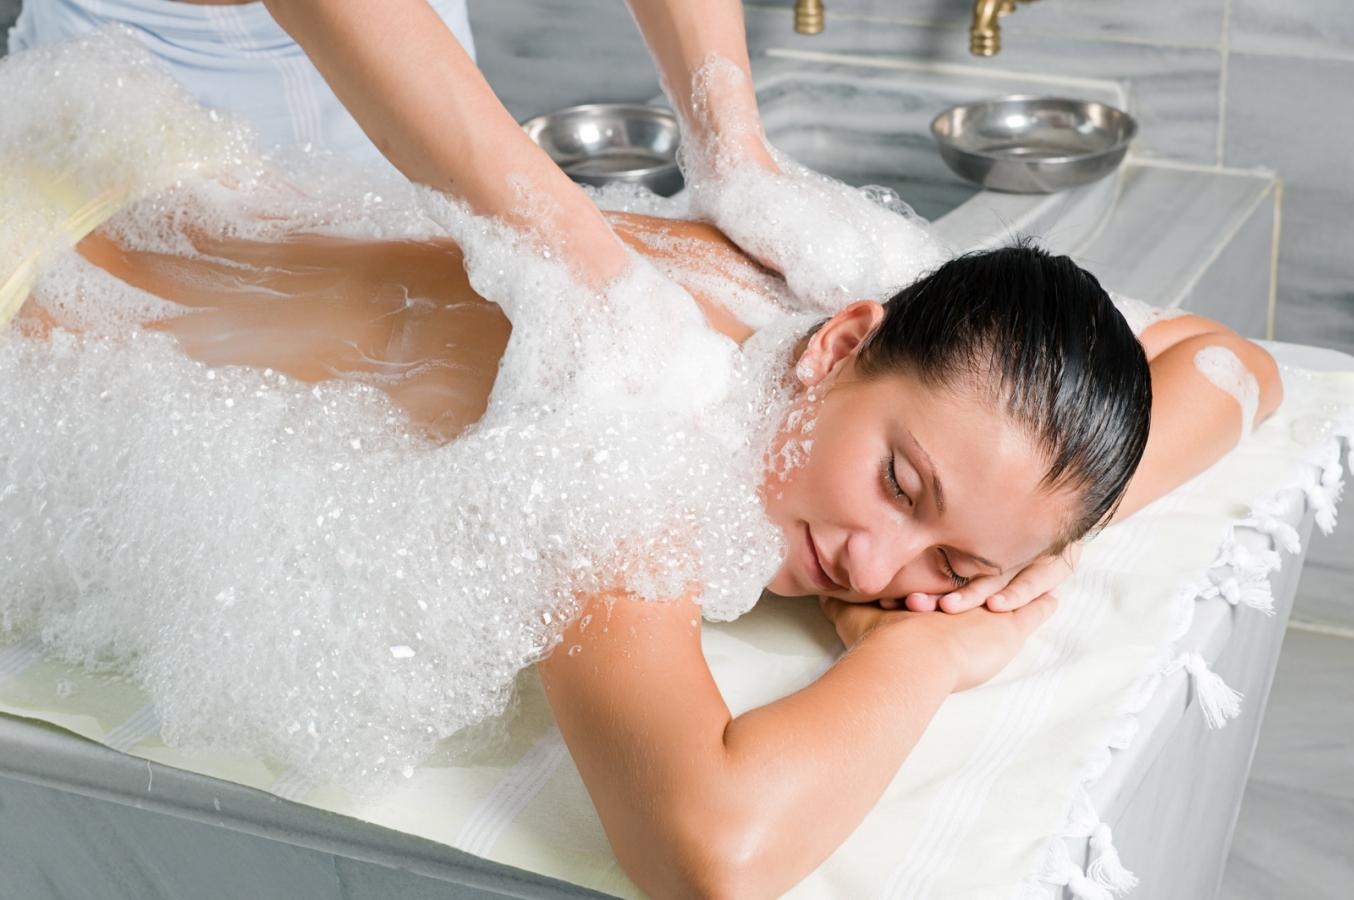 Belek Turkish Bath Full Body Relaxation Massage At The